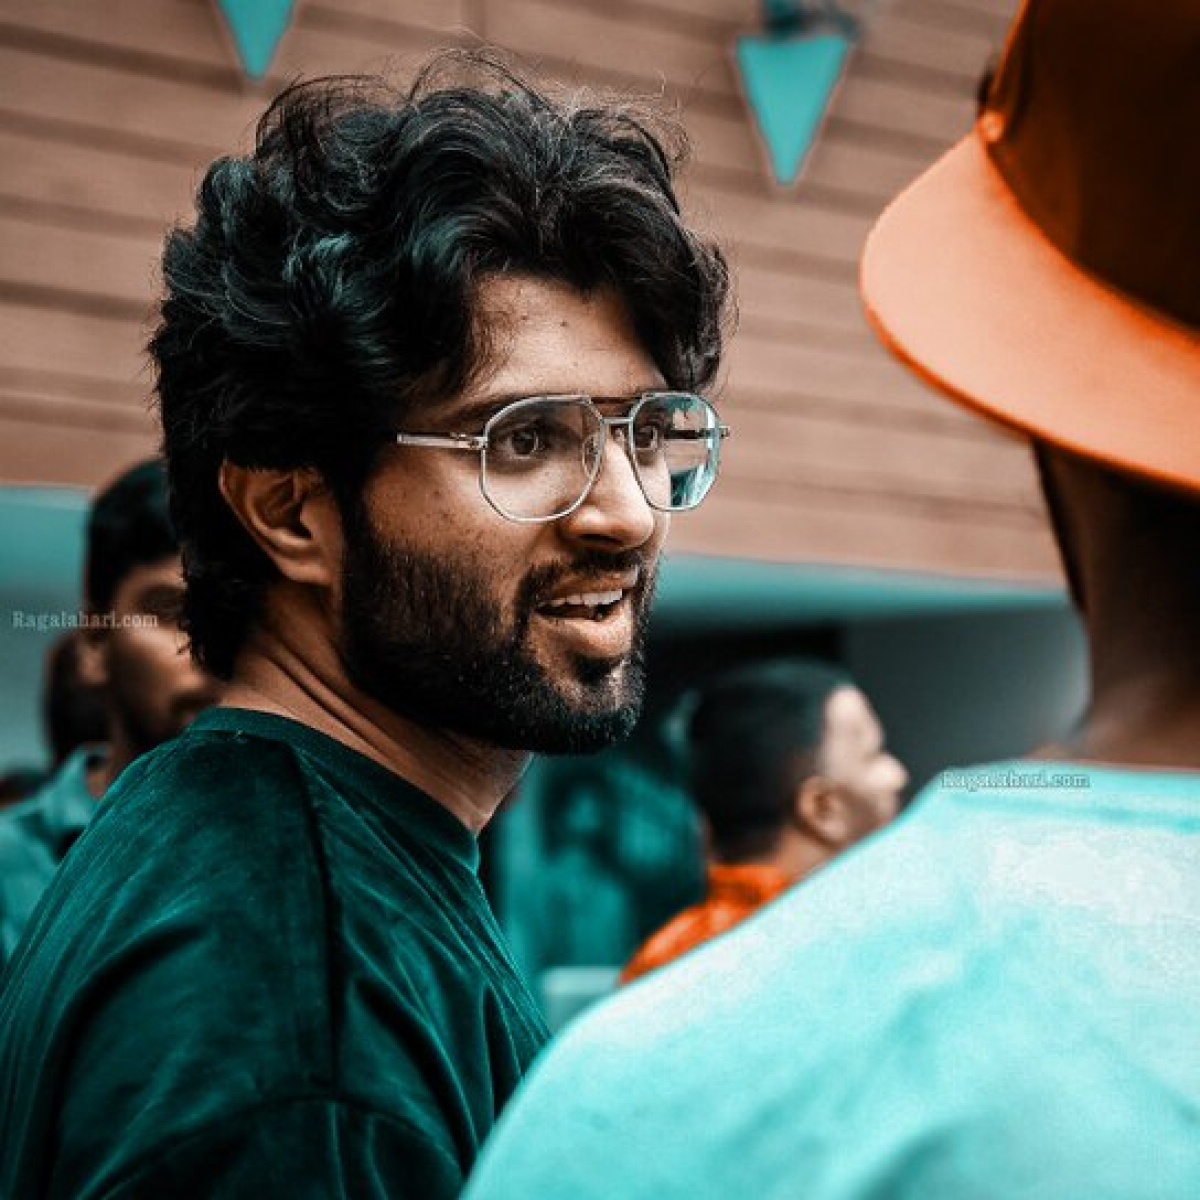 'I strive to entertain': Vijay Deverakonda